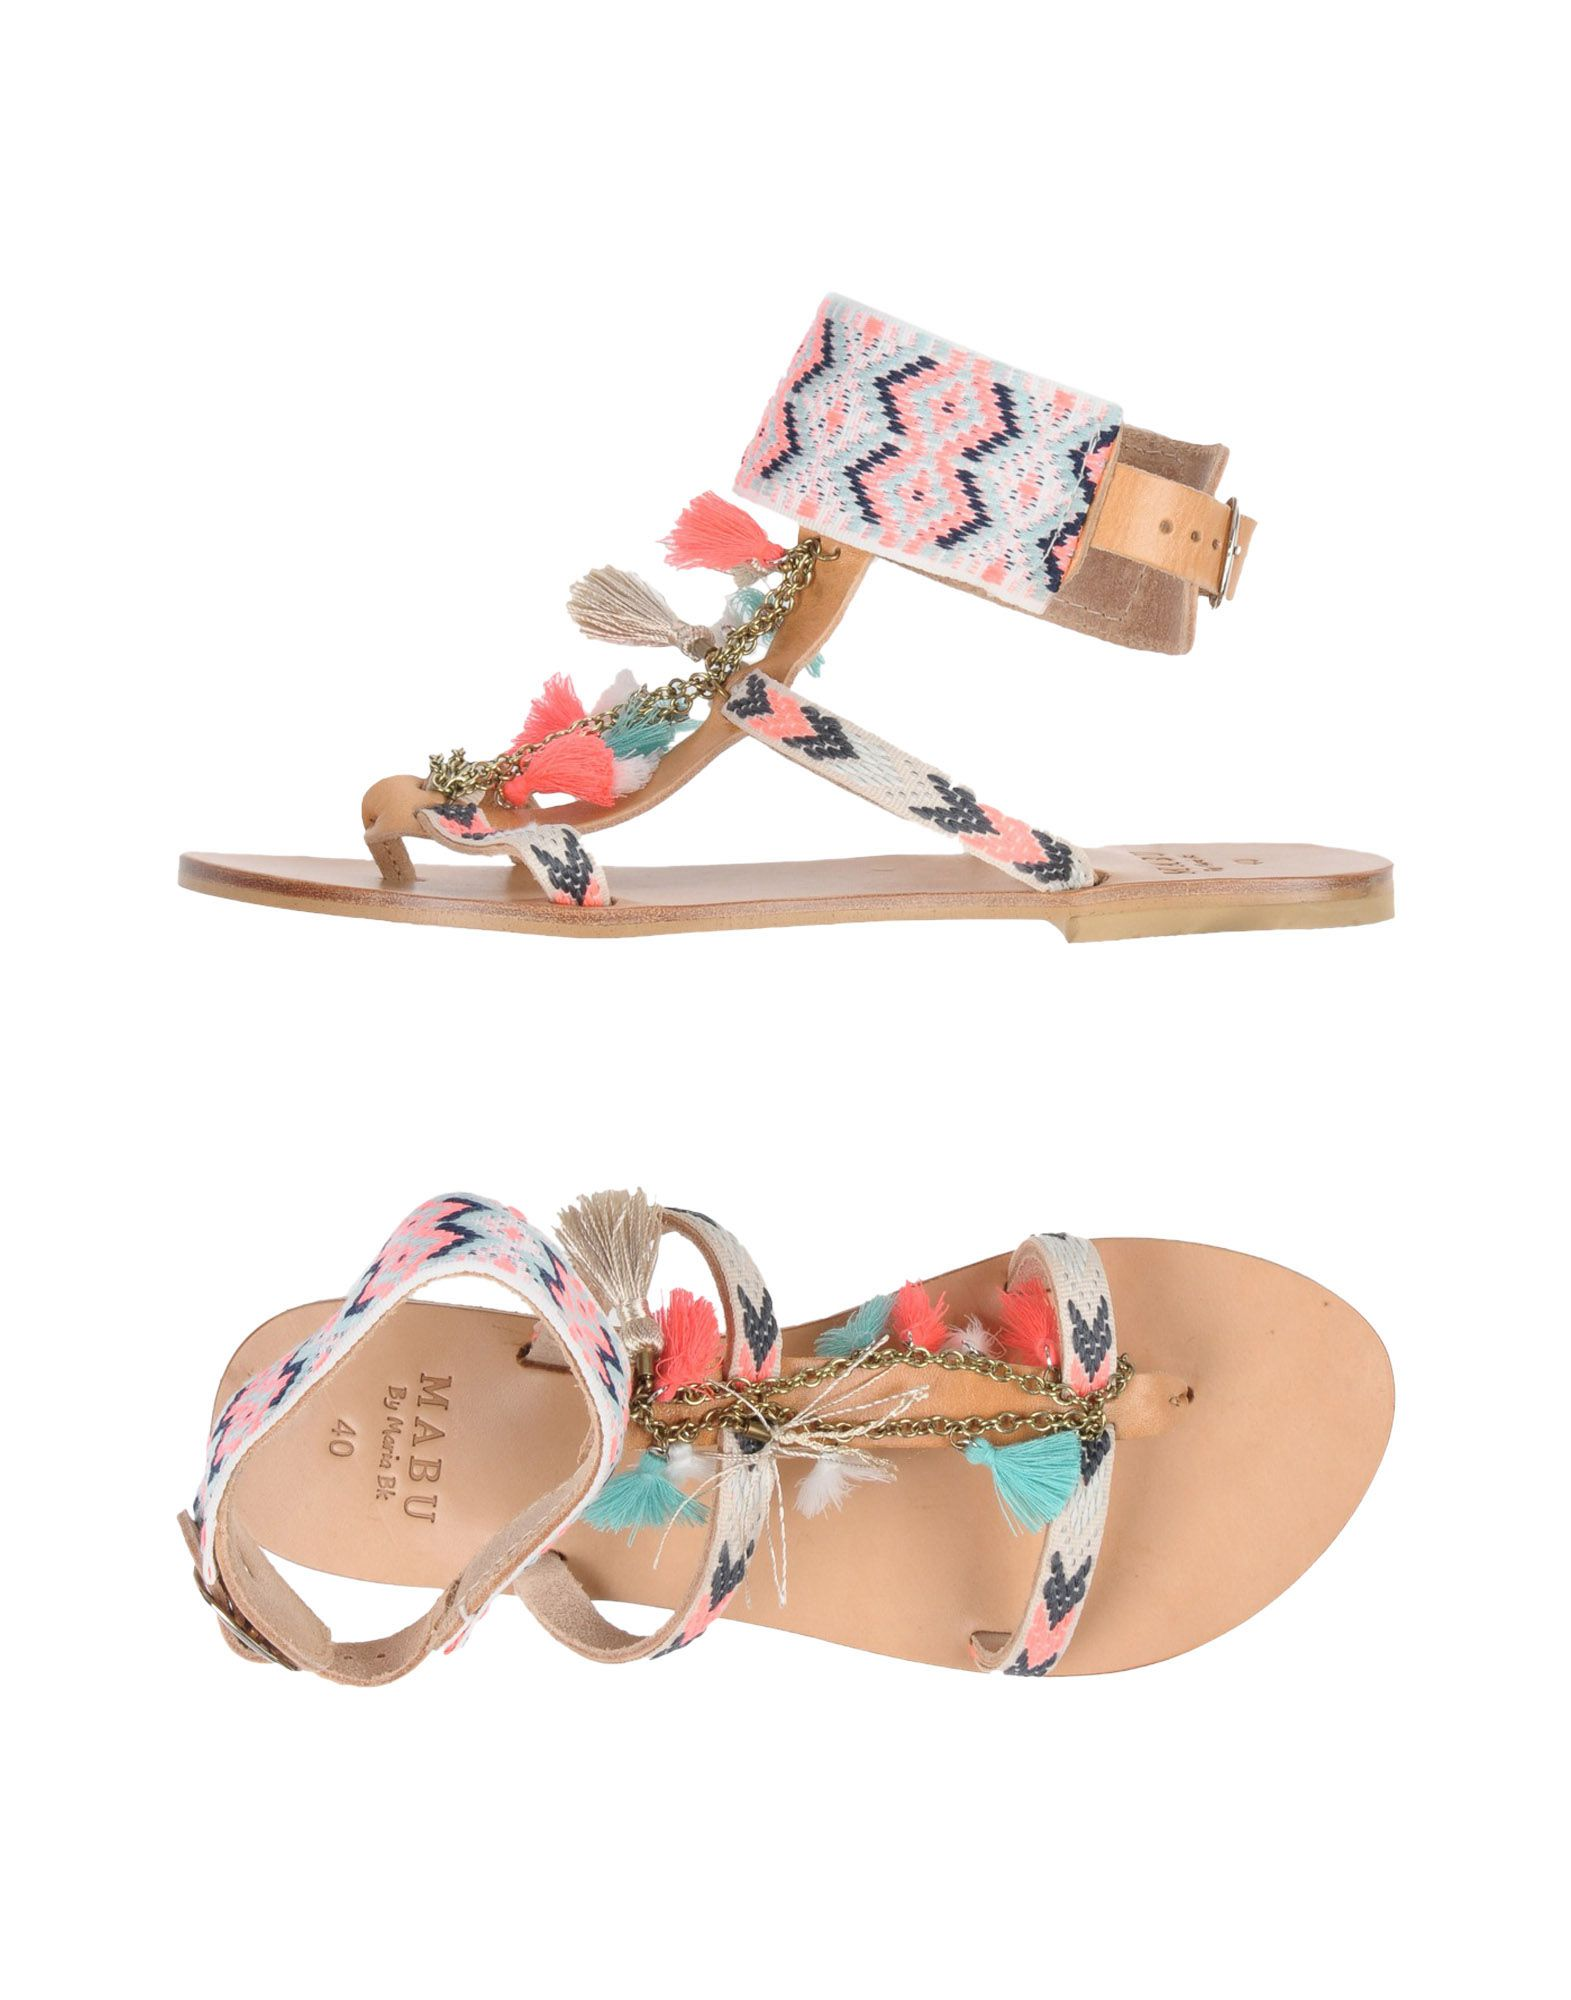 Mabu By Gute Maria Bk Dianetten Damen  11481117OB Gute By Qualität beliebte Schuhe eacc1b